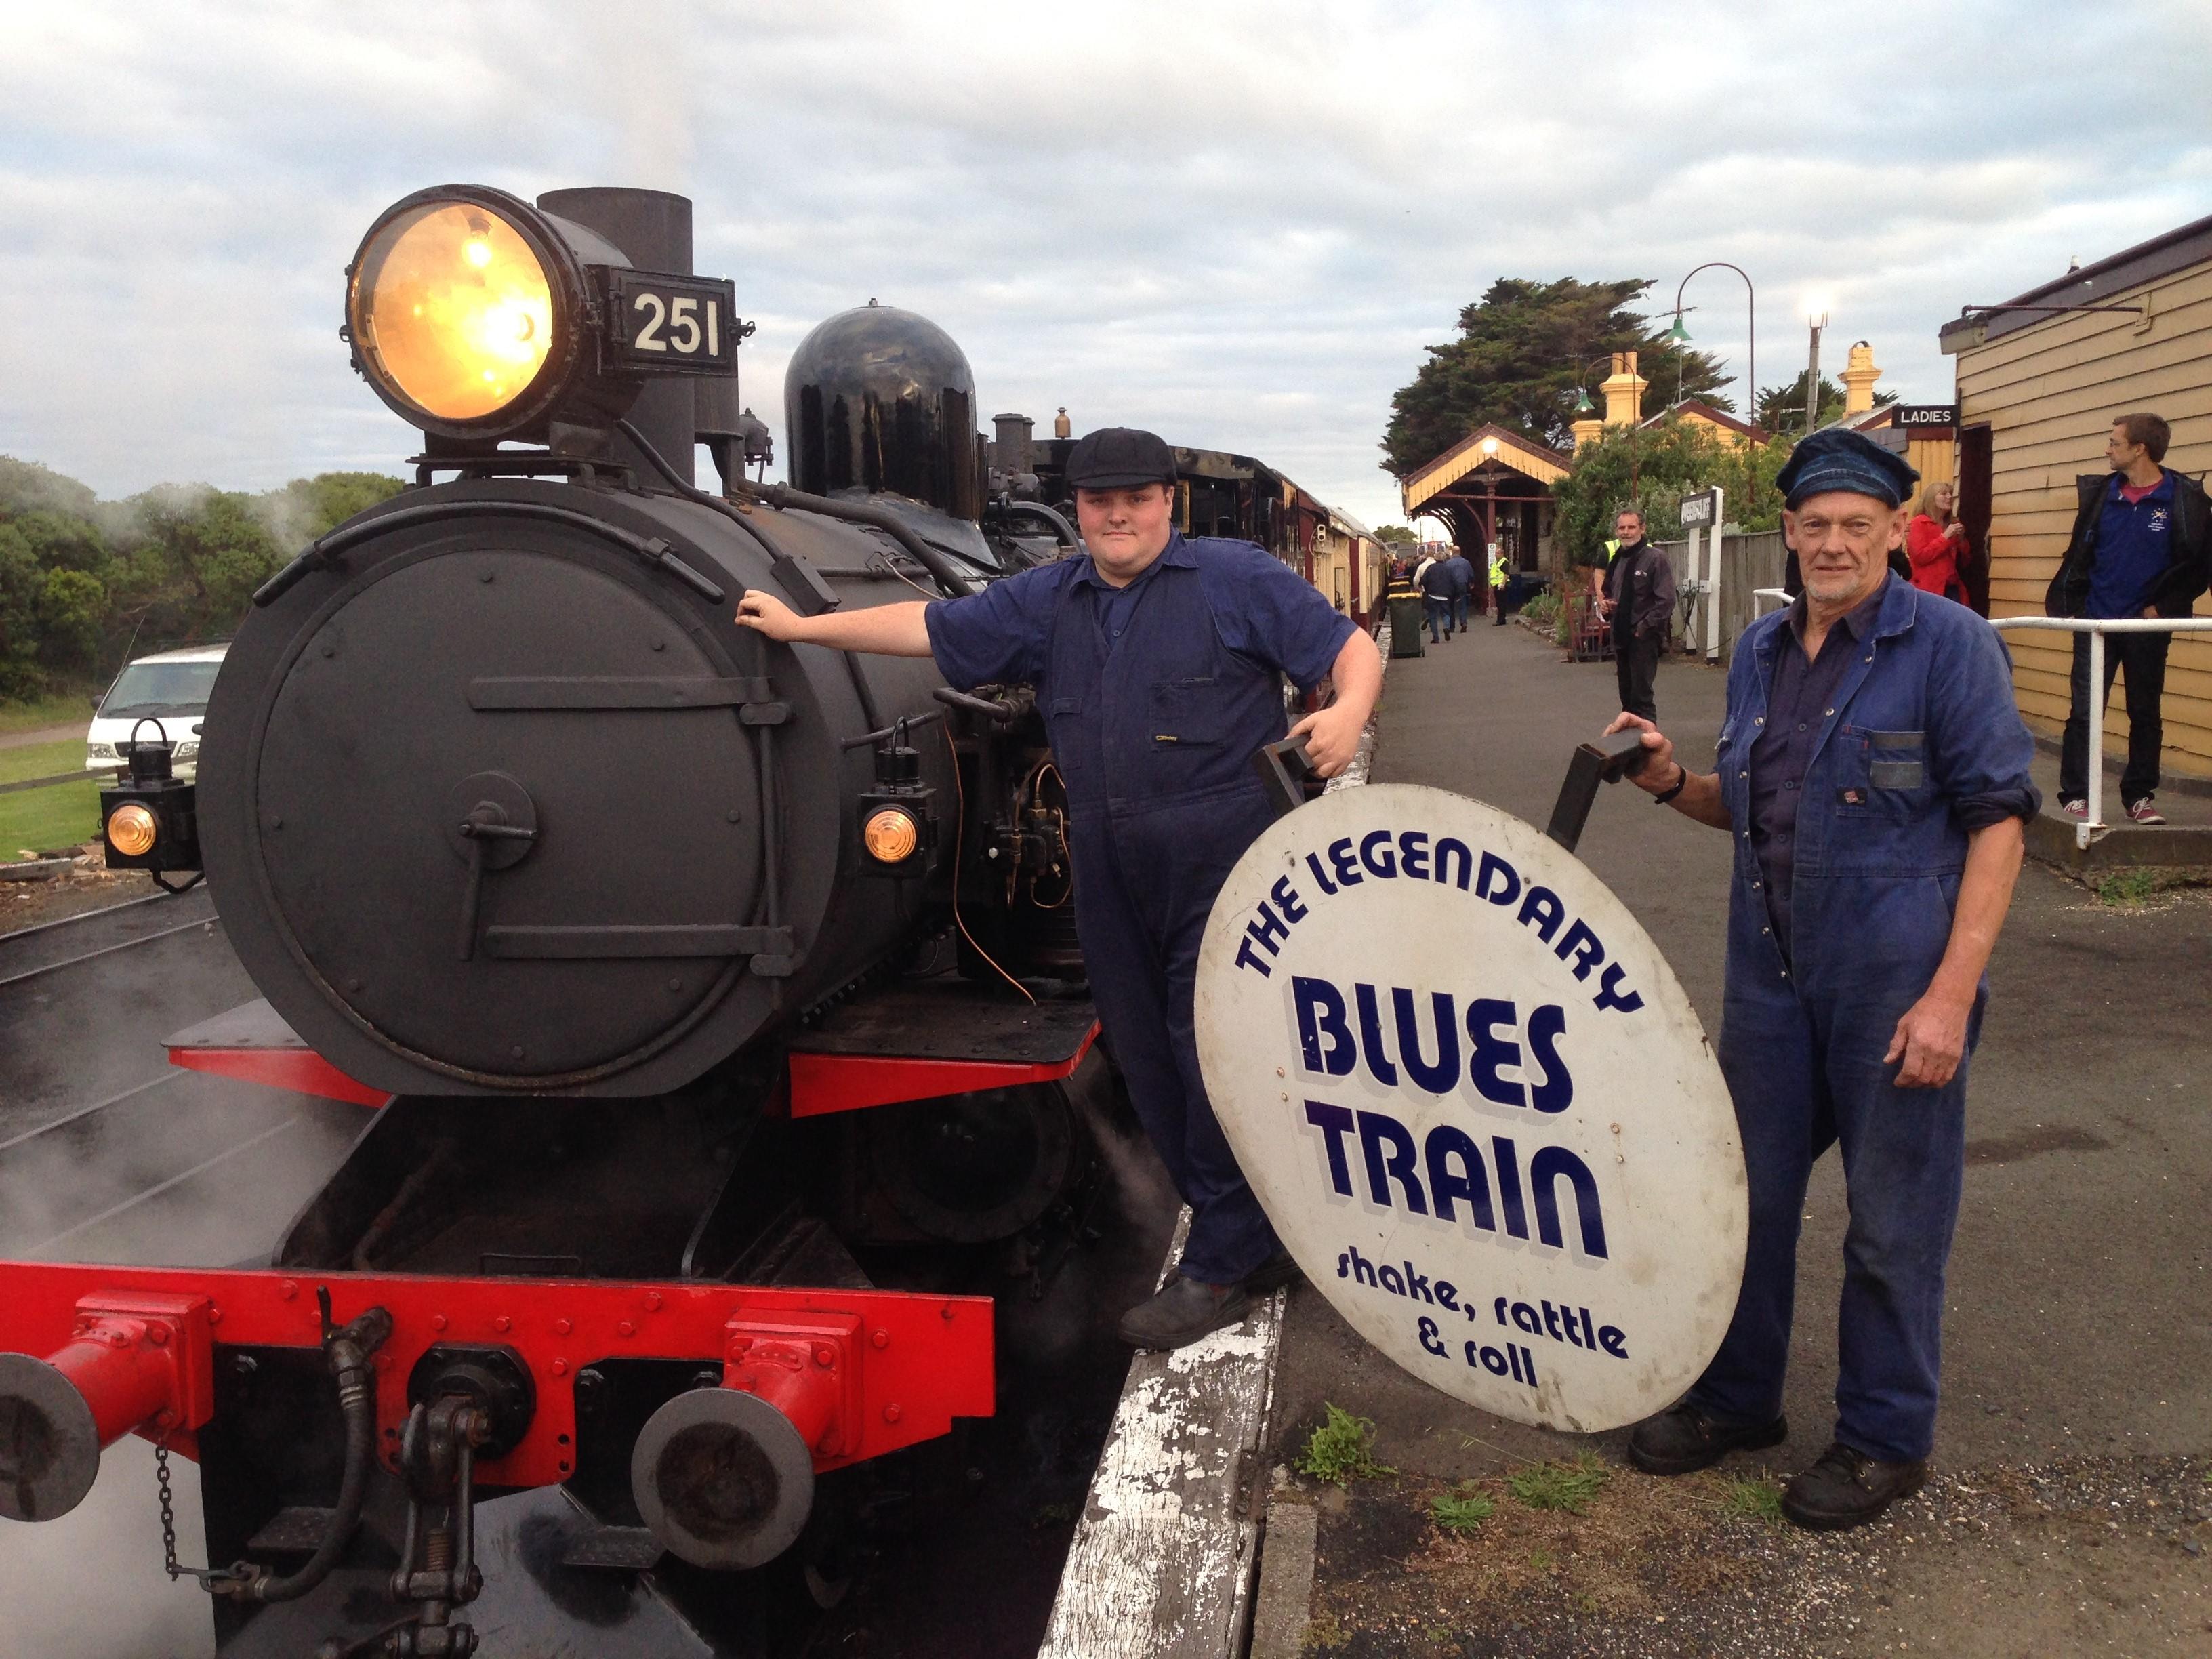 Volunteers for the Blues Train on the Bellarine Railway